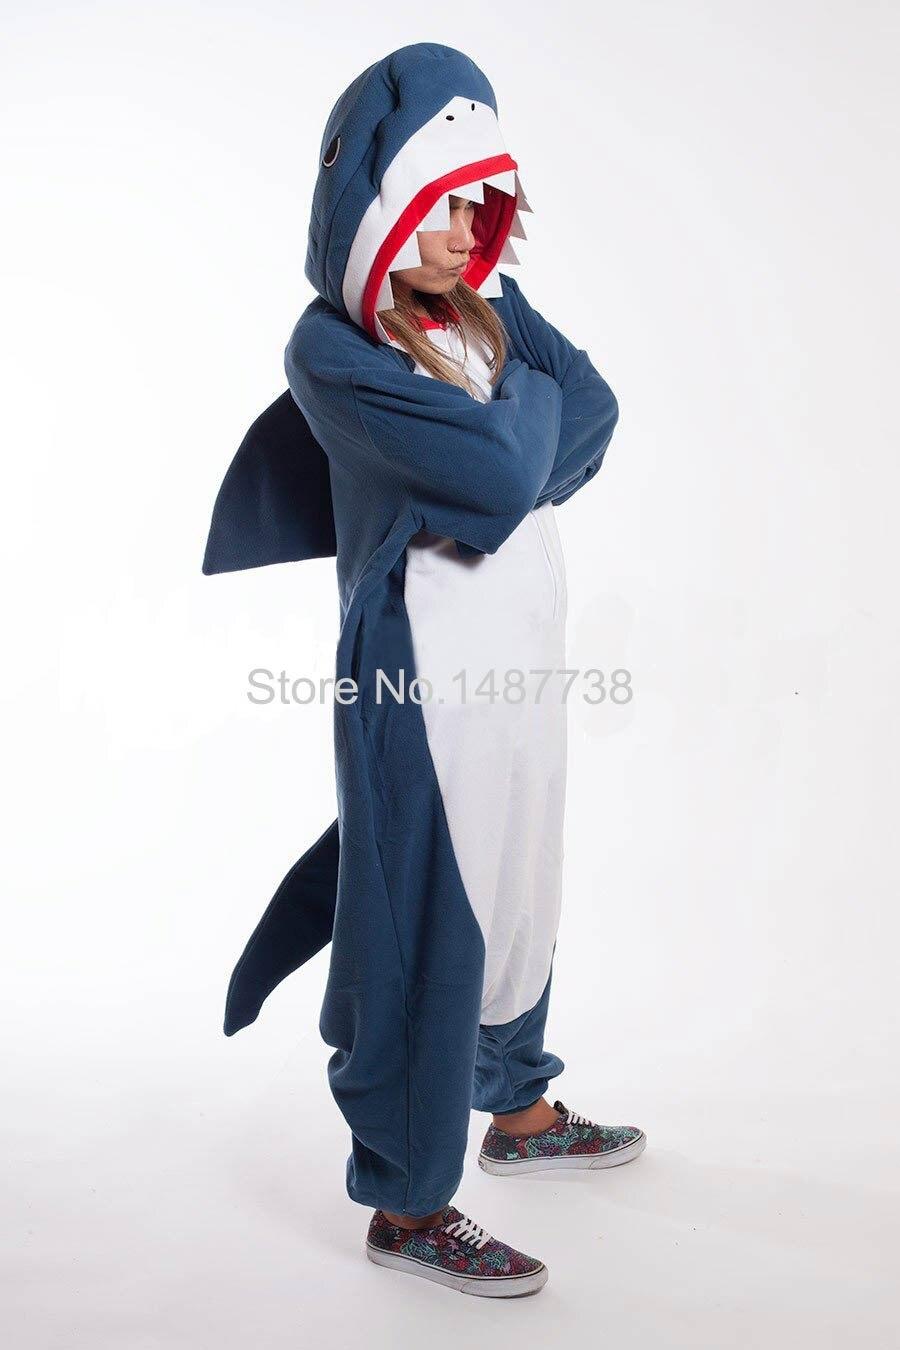 Analitico Adulto Verdesca Tutina Pajamas Sleepwear Homewear